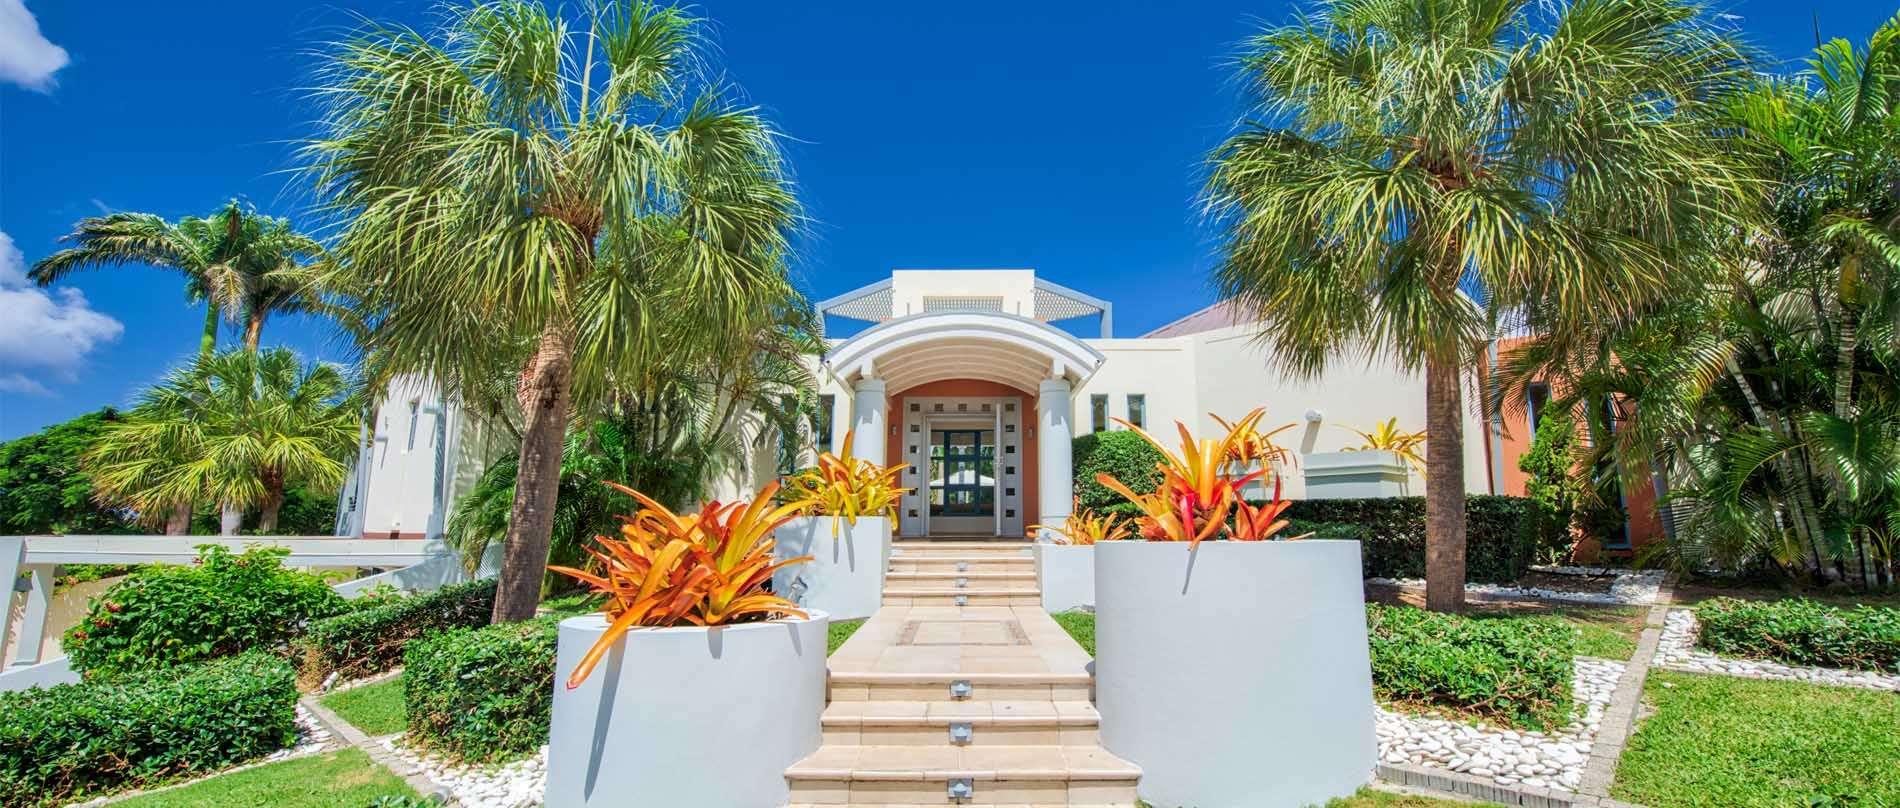 Luxury villa rentals caribbean - St martin - Saint martin french - Les terres basses - Villa Les Palmiers Bleus - Image 1/29